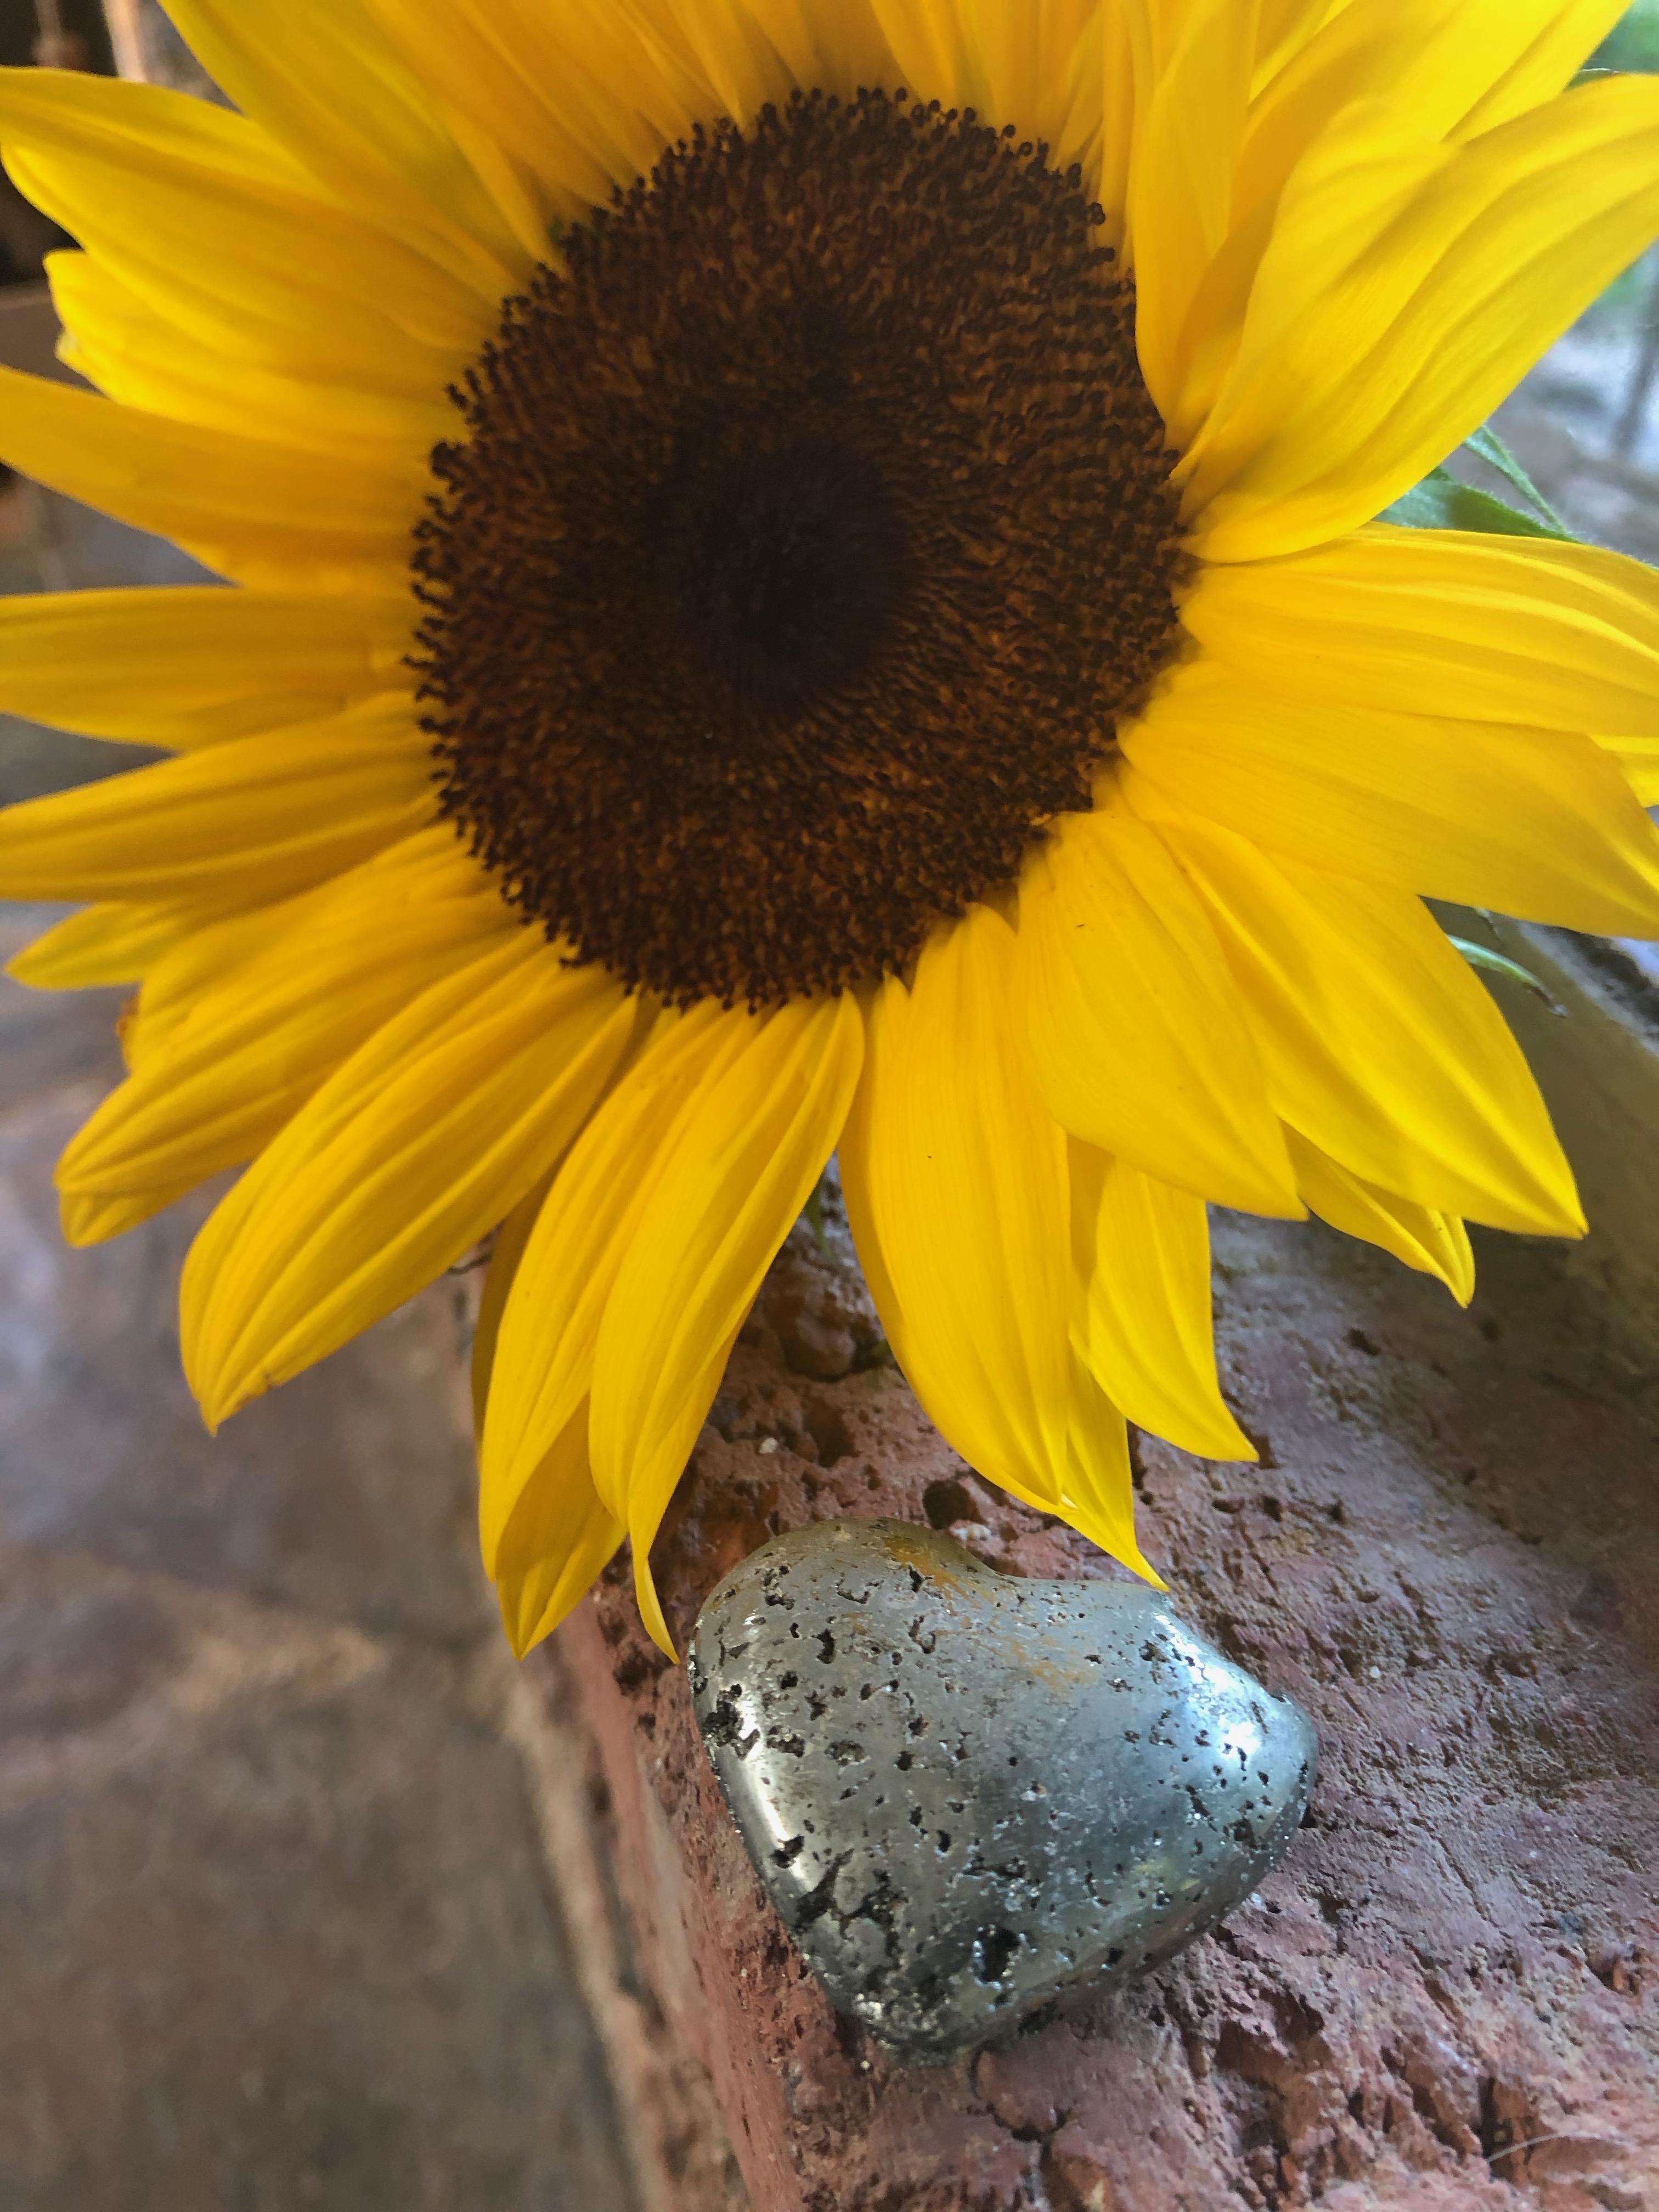 Enjoy The Sunflowers